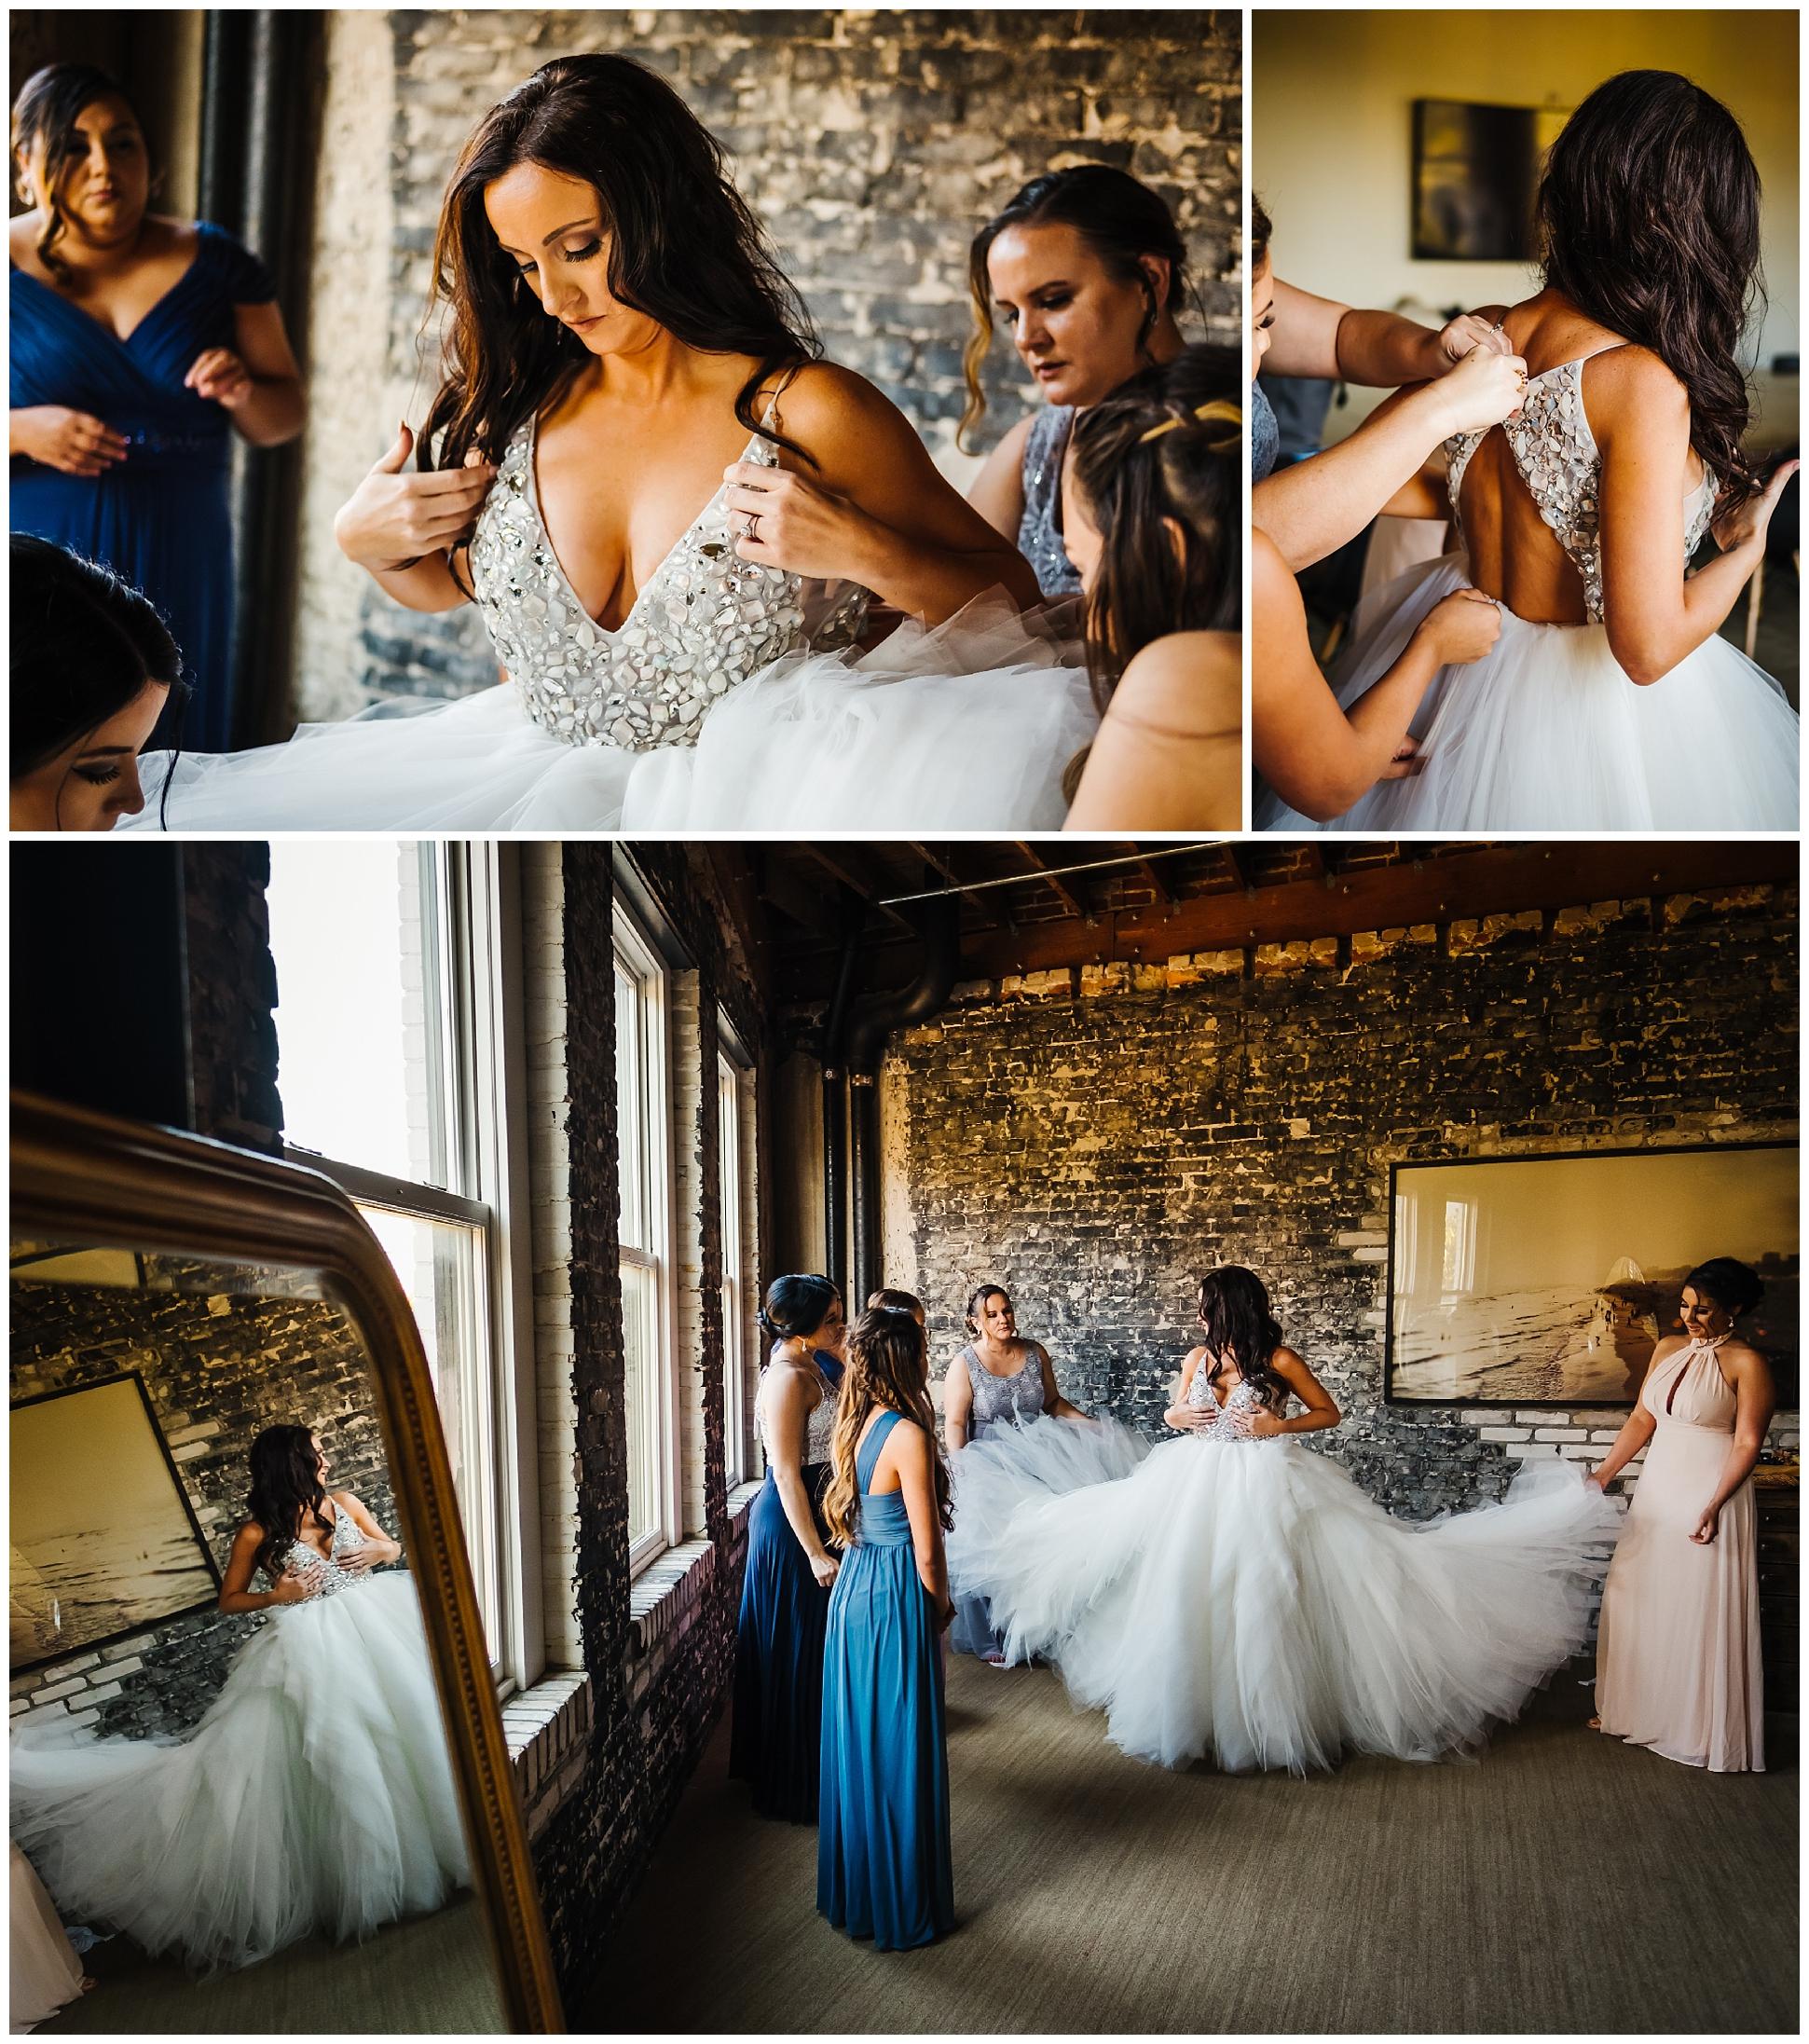 tampa-wedding-photographer-oxford-exchange-garland-candlelight-gold-hayley-paige_0010.jpg